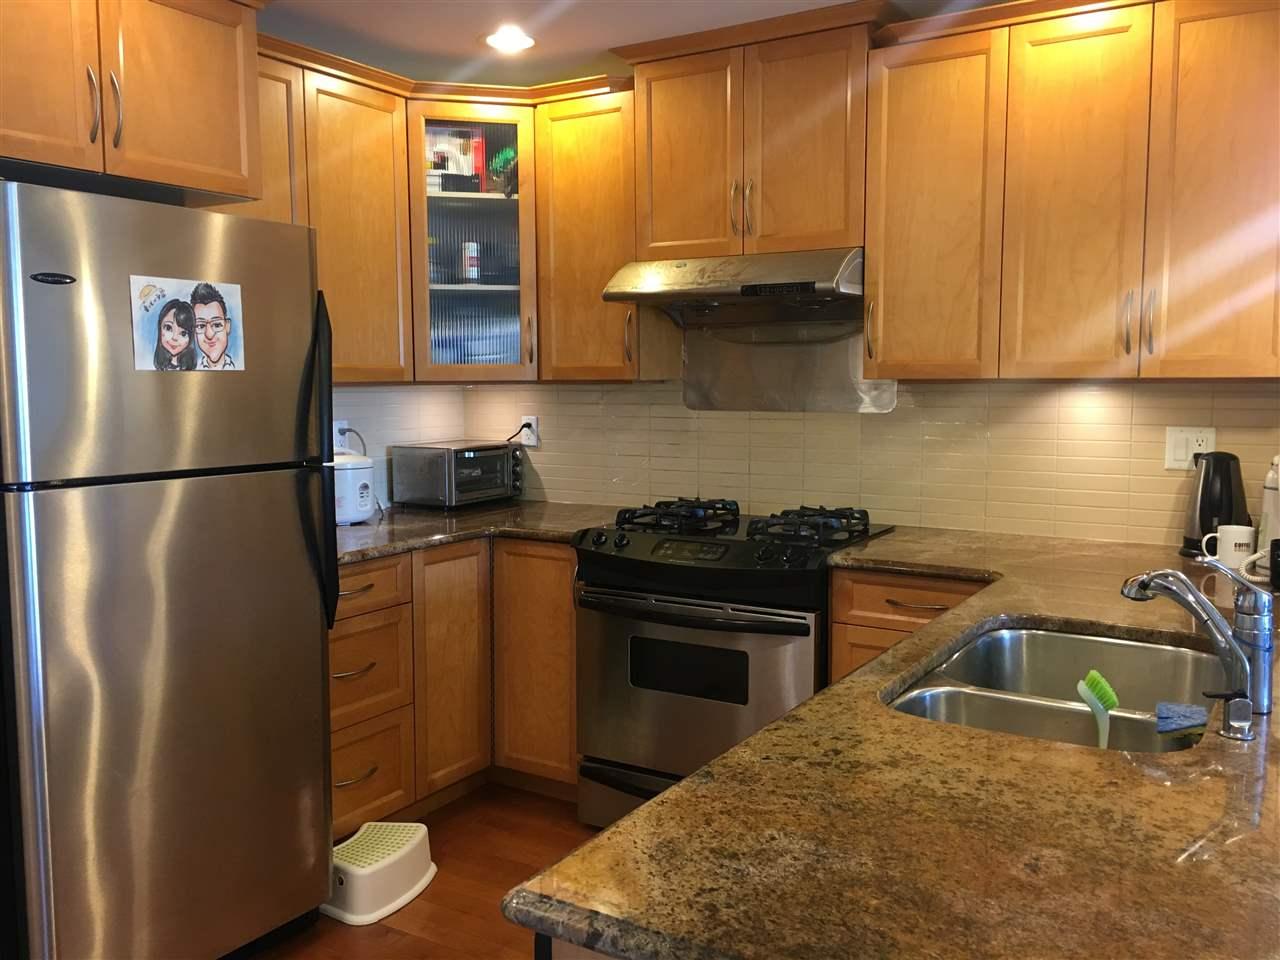 Condo Apartment at 306 2103 W 45TH AVENUE, Unit 306, Vancouver West, British Columbia. Image 6